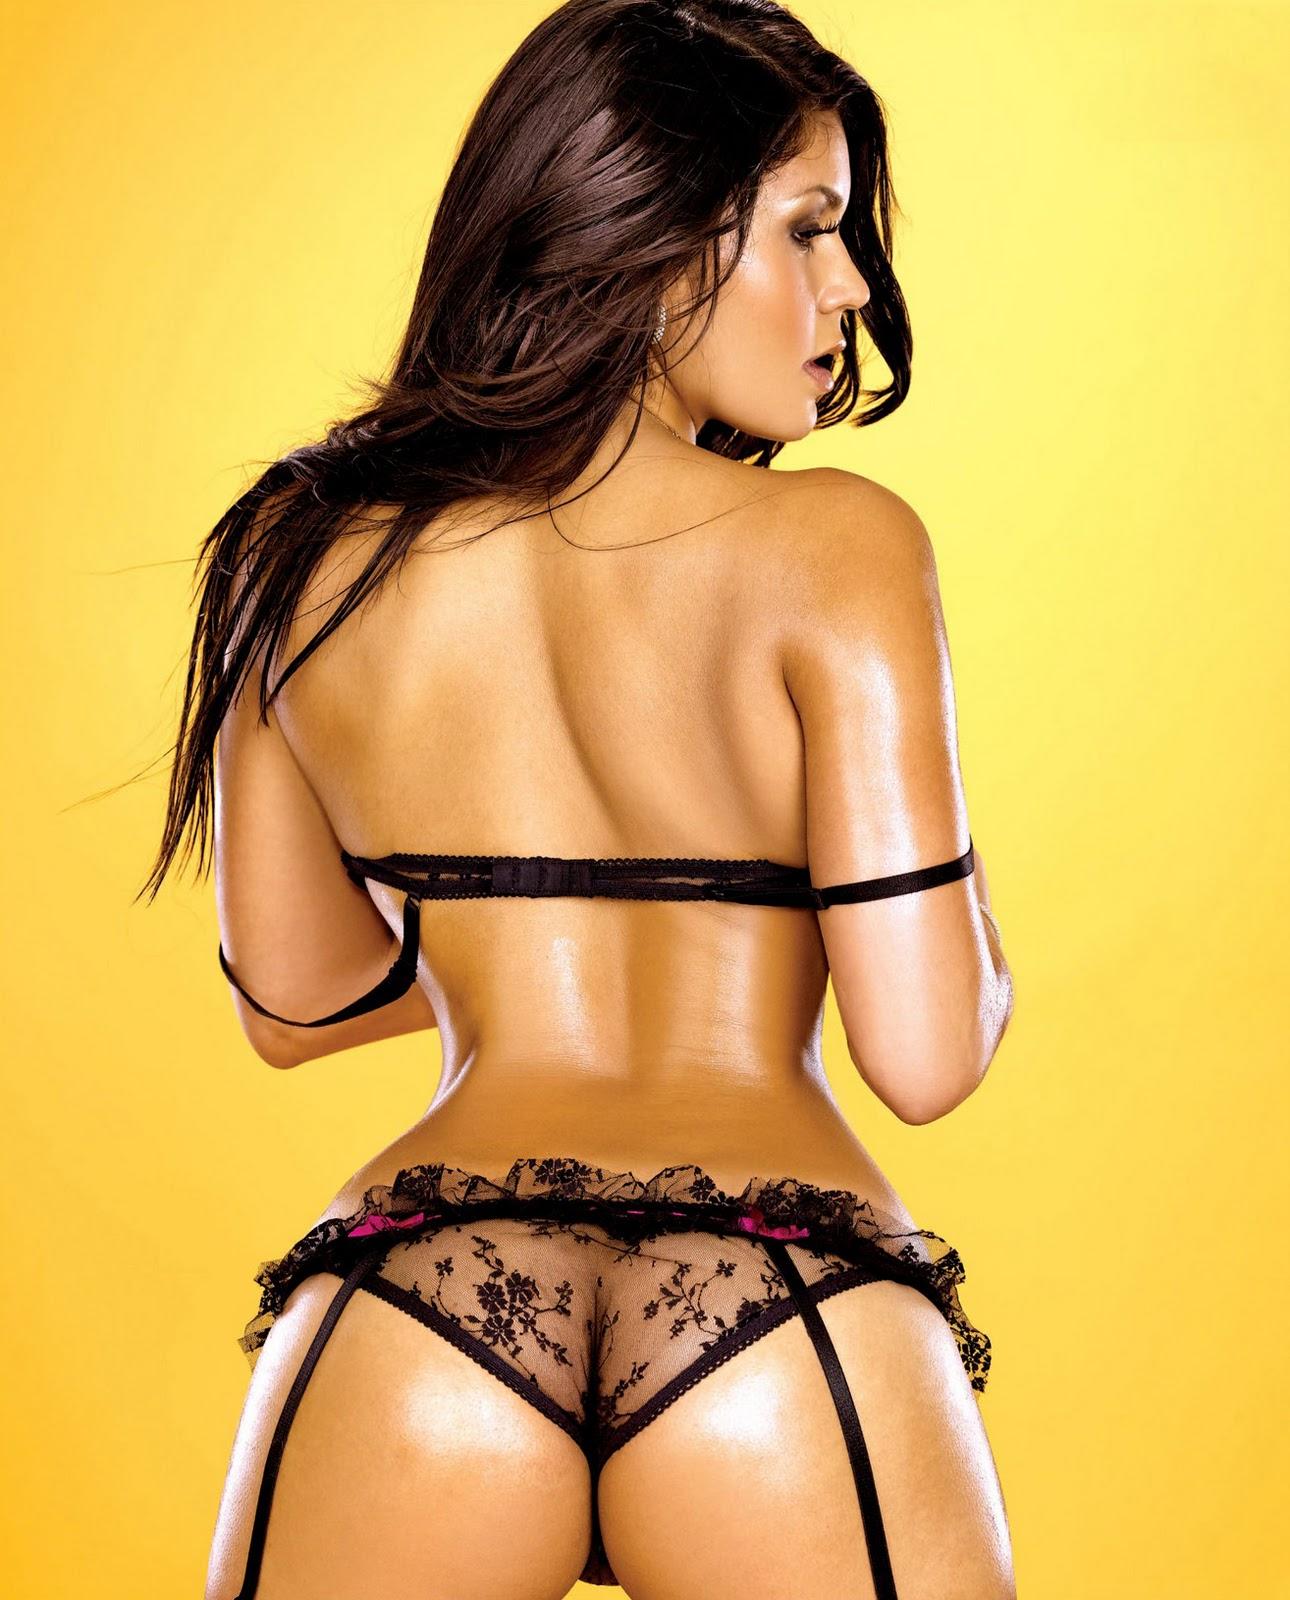 hot latinas in lingerie